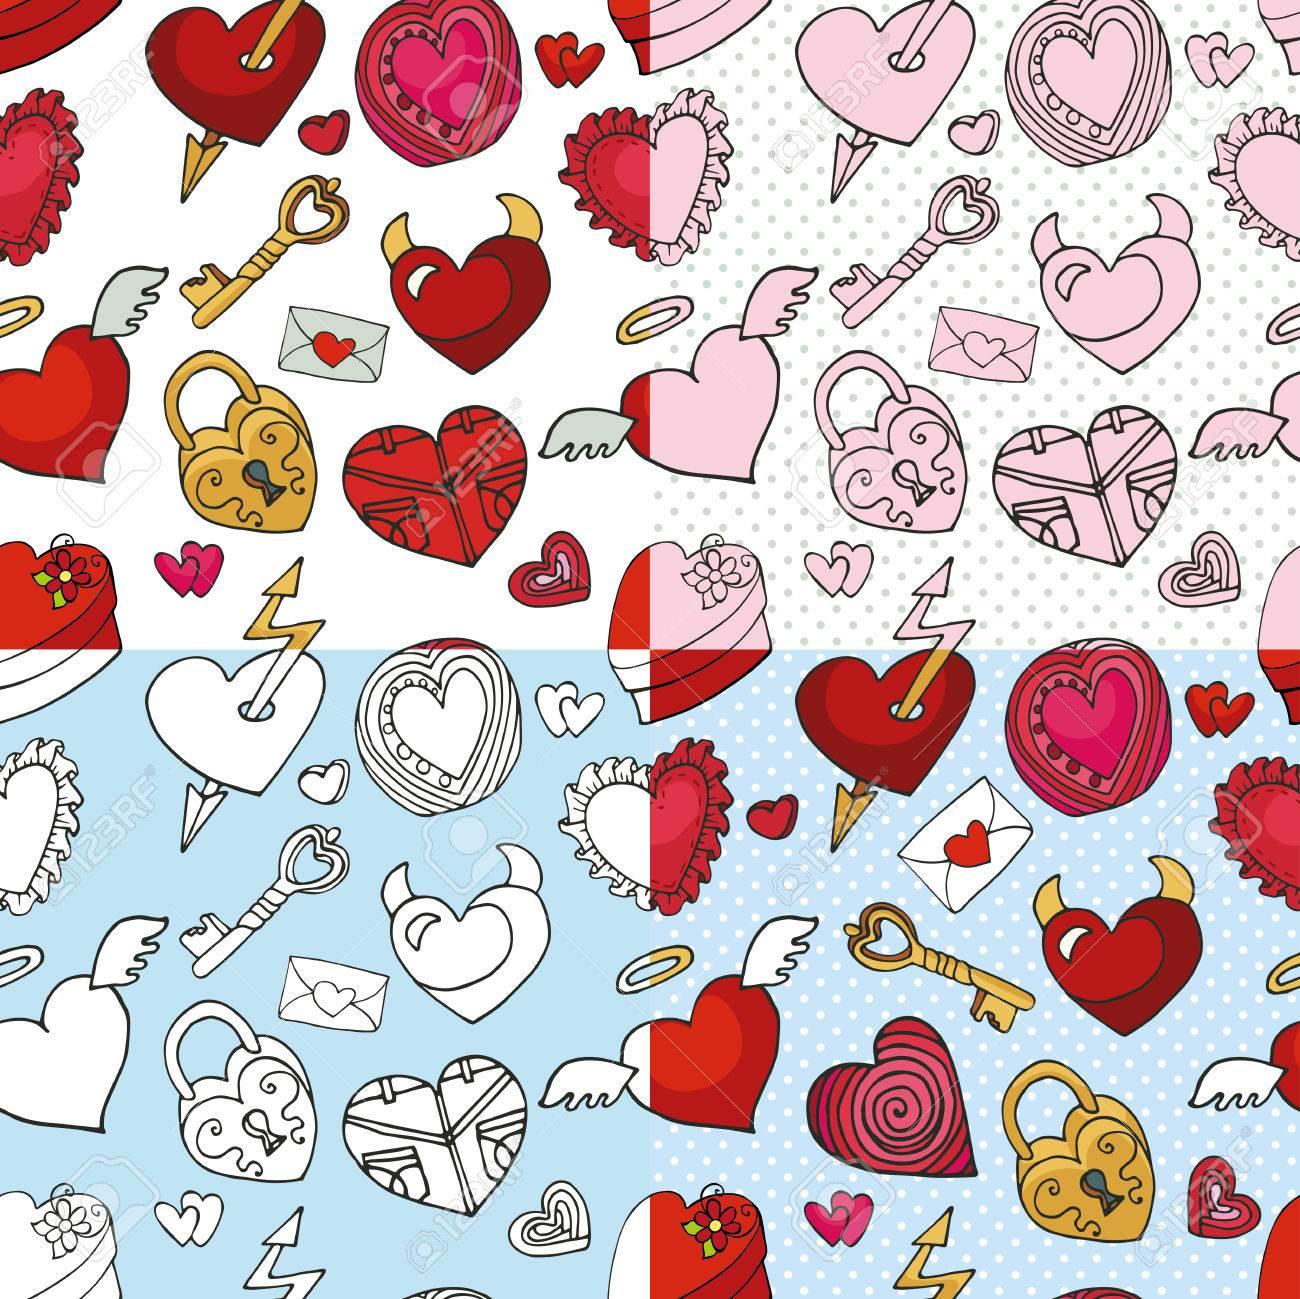 Valentines Day Wedding Love Romantic Hearts Decor Elements In